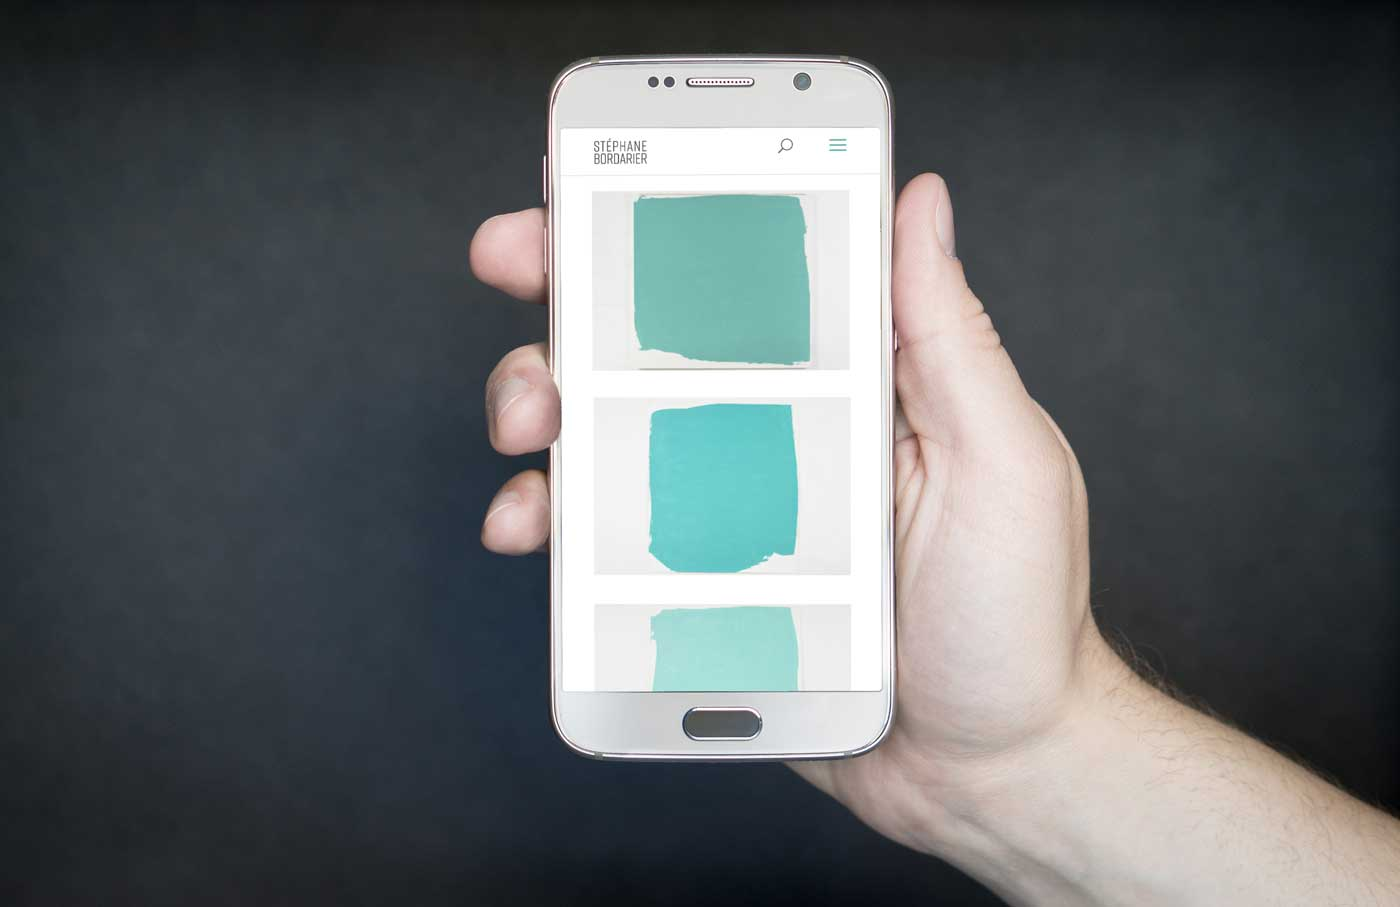 stephane-bordarier-smartphone